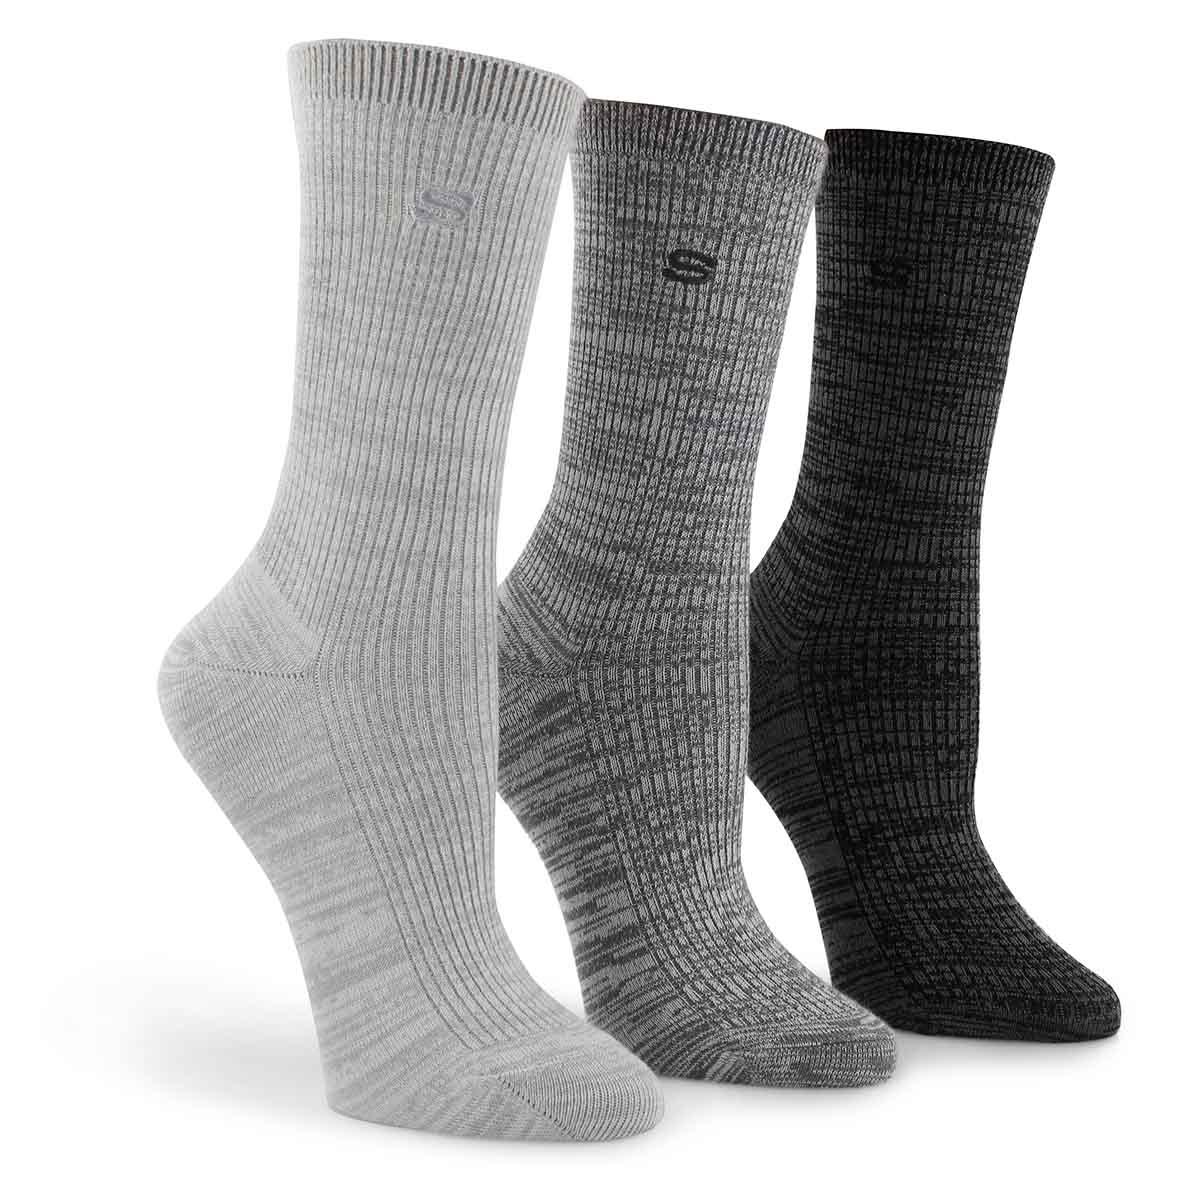 Women's NON TERRY CREW grey socks - 3 pack